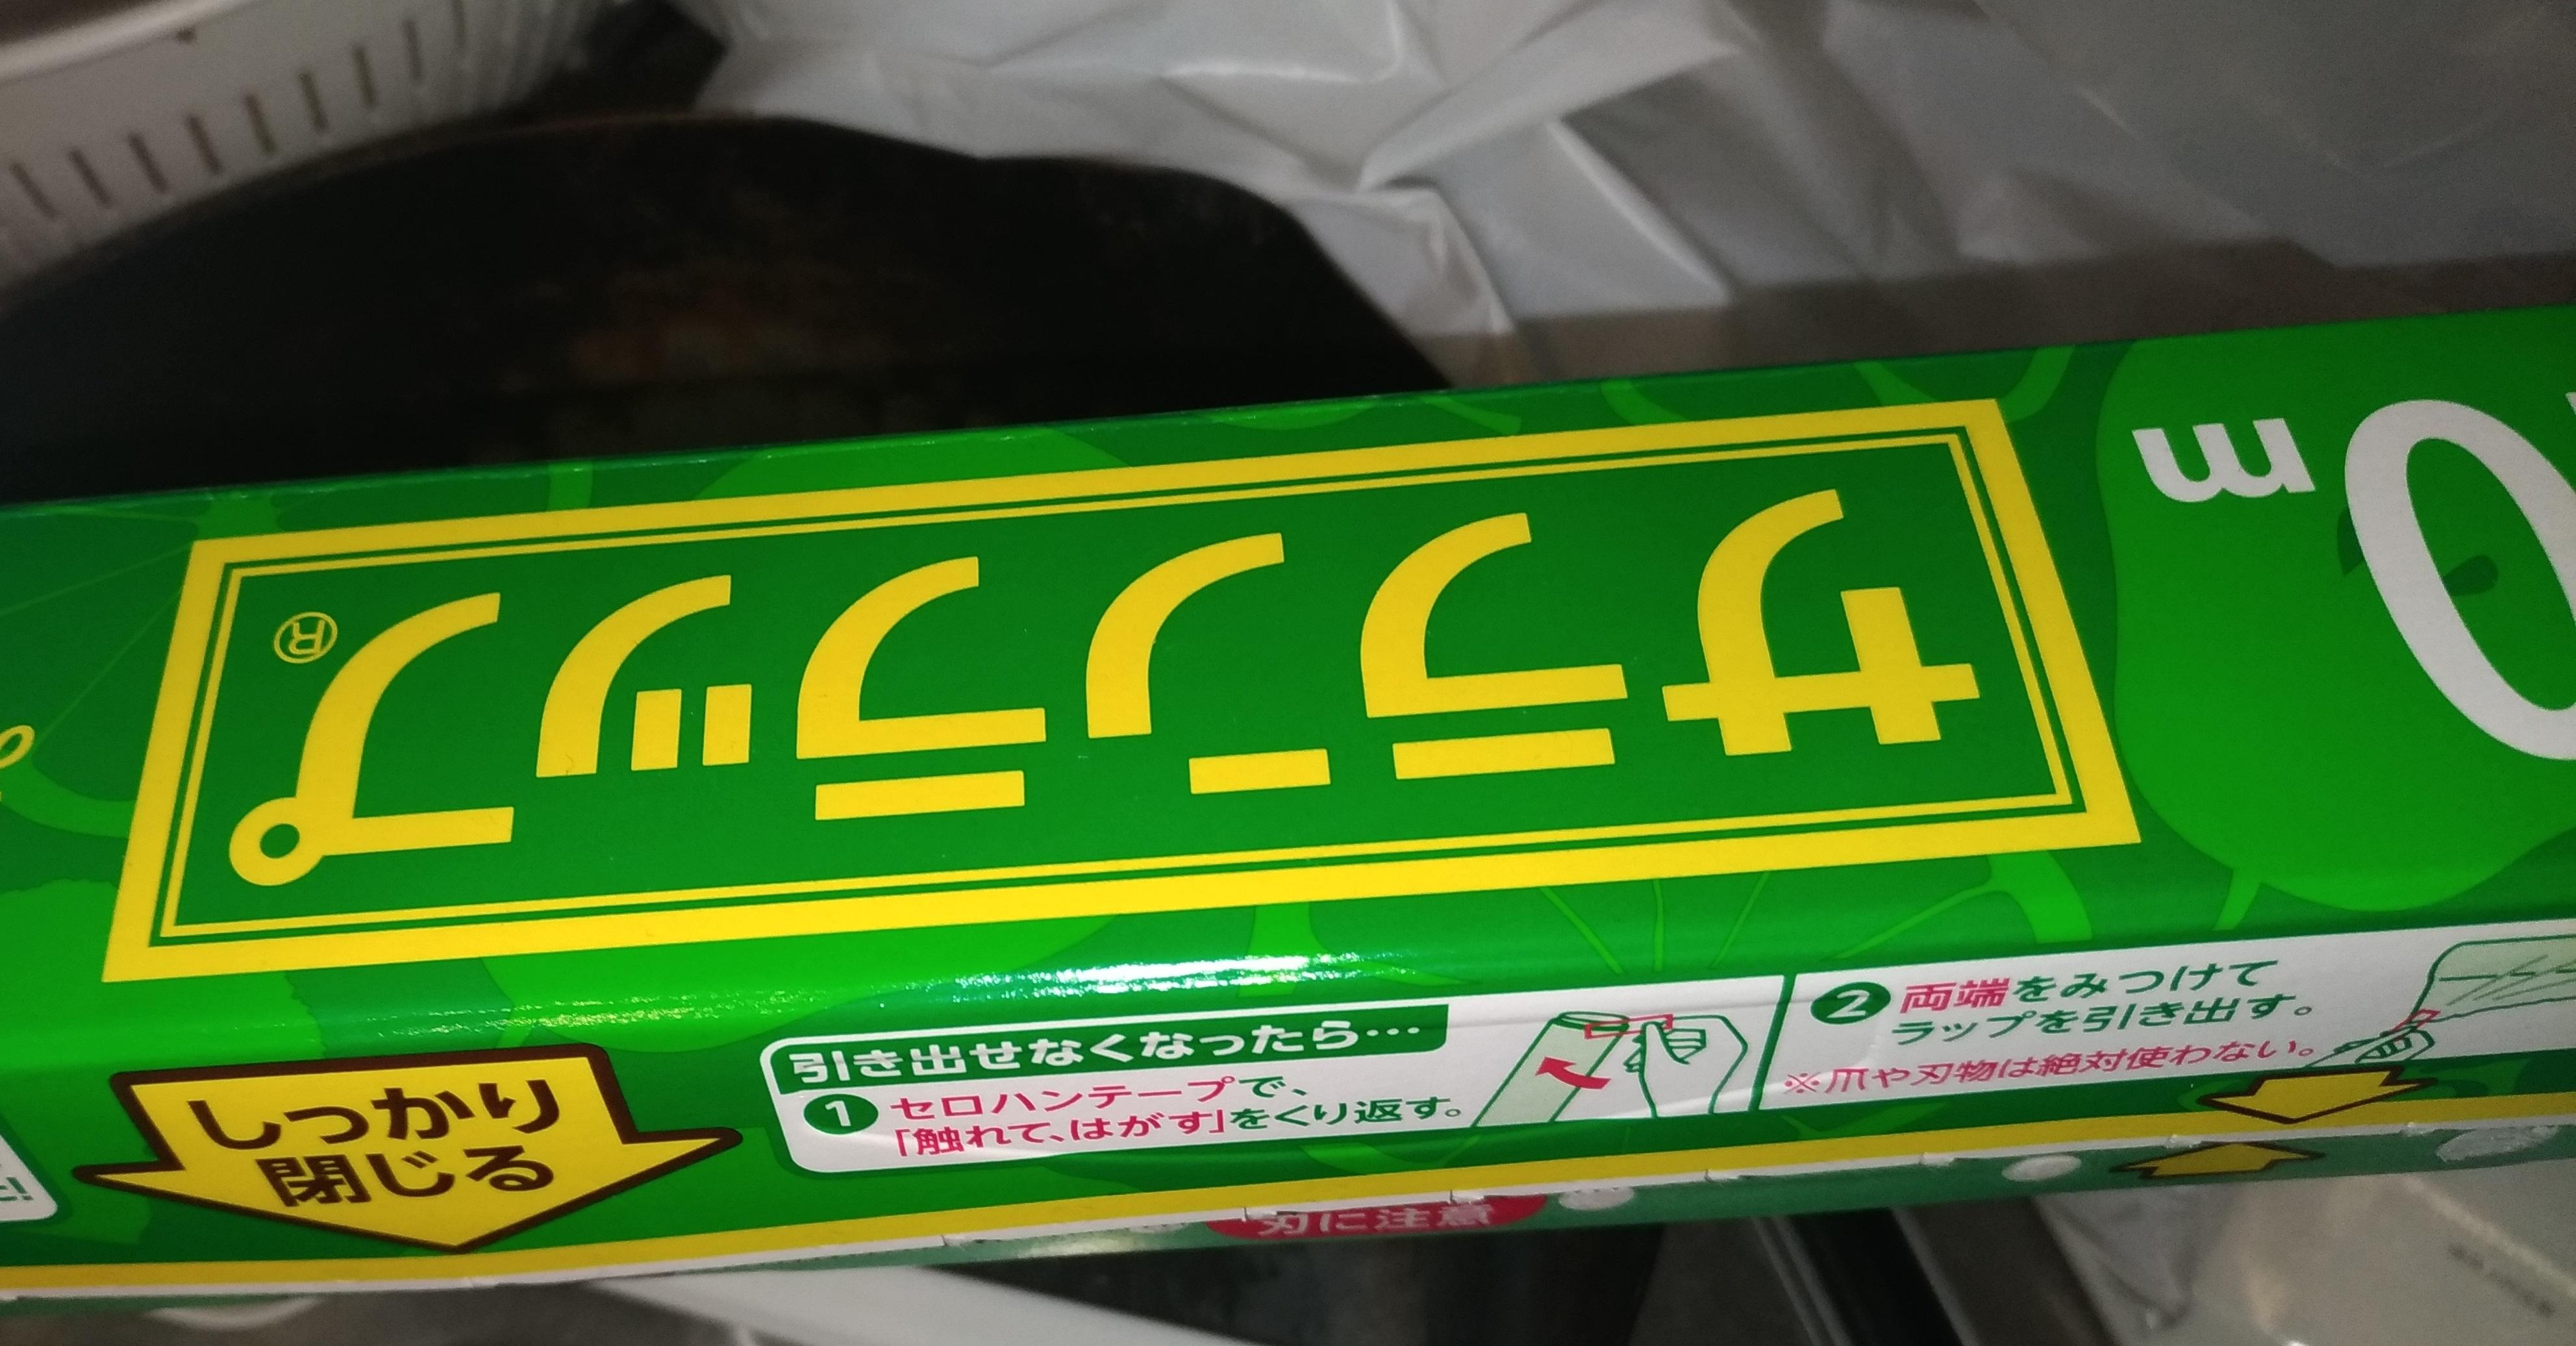 renji_sara_daiyou_osaka_hitori_1.jpg